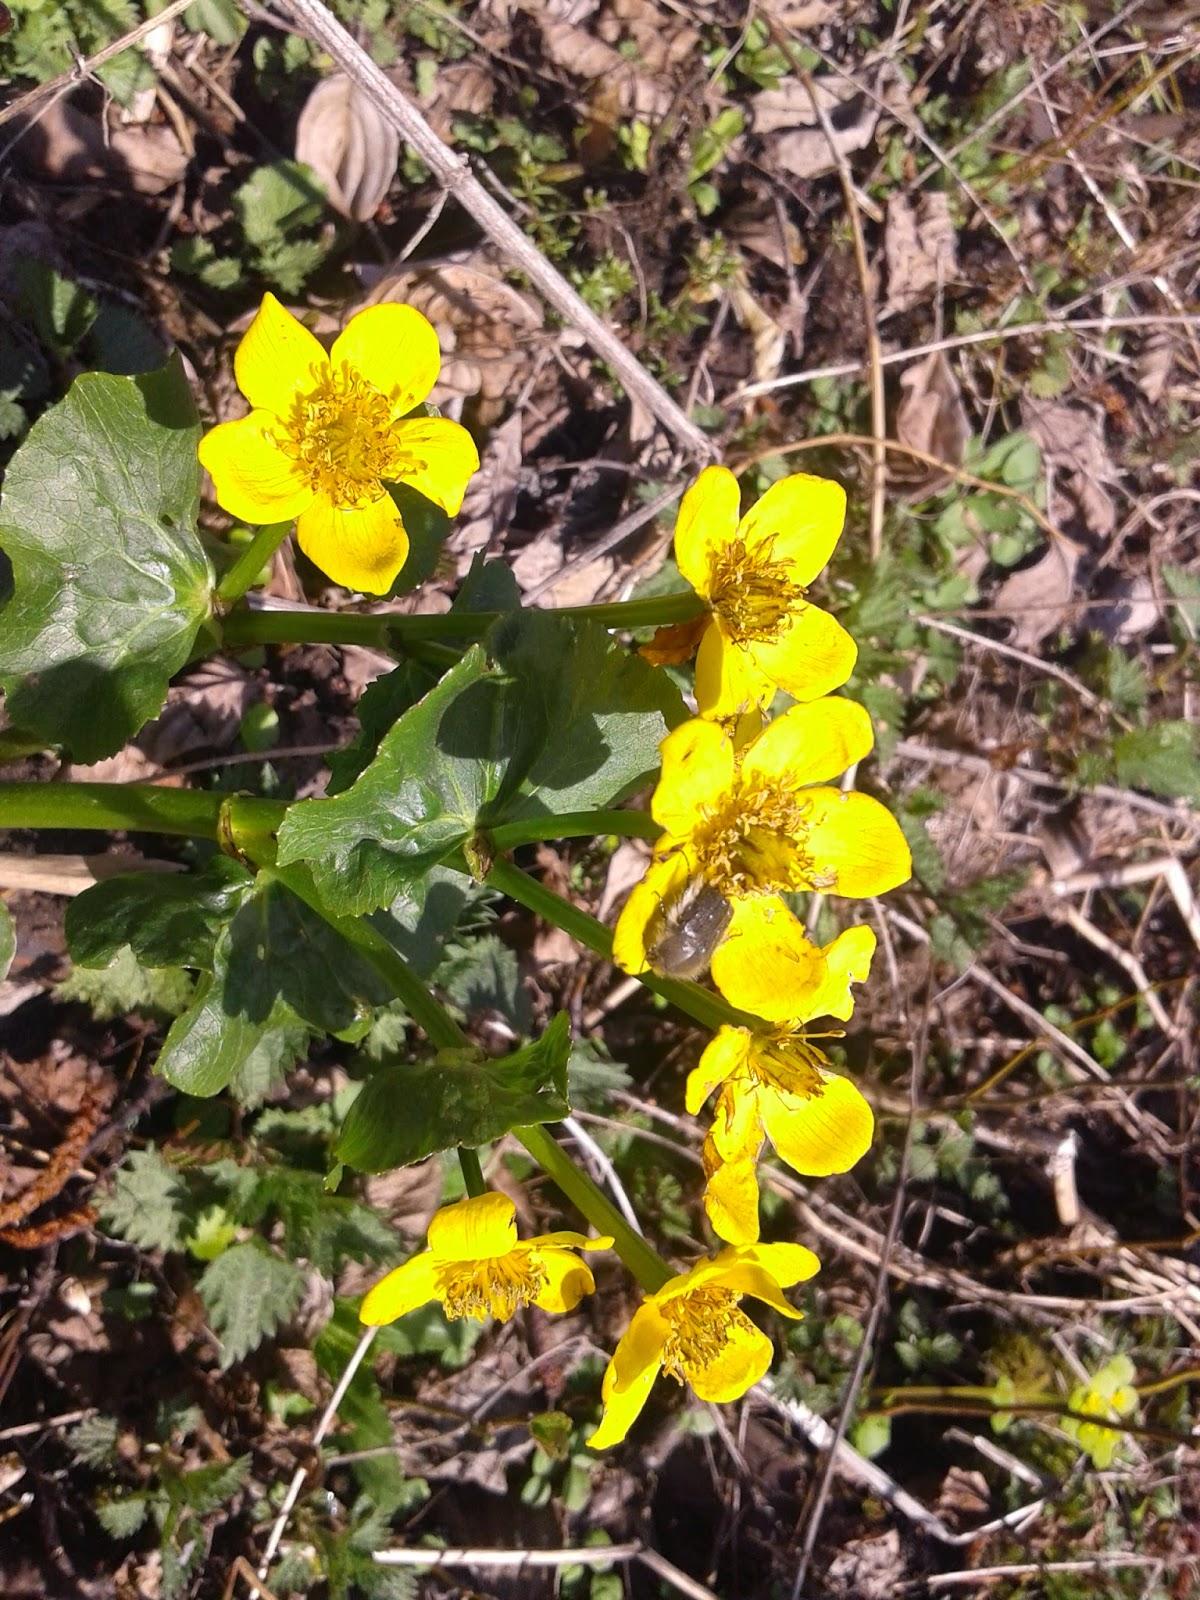 фото, весенние цветы